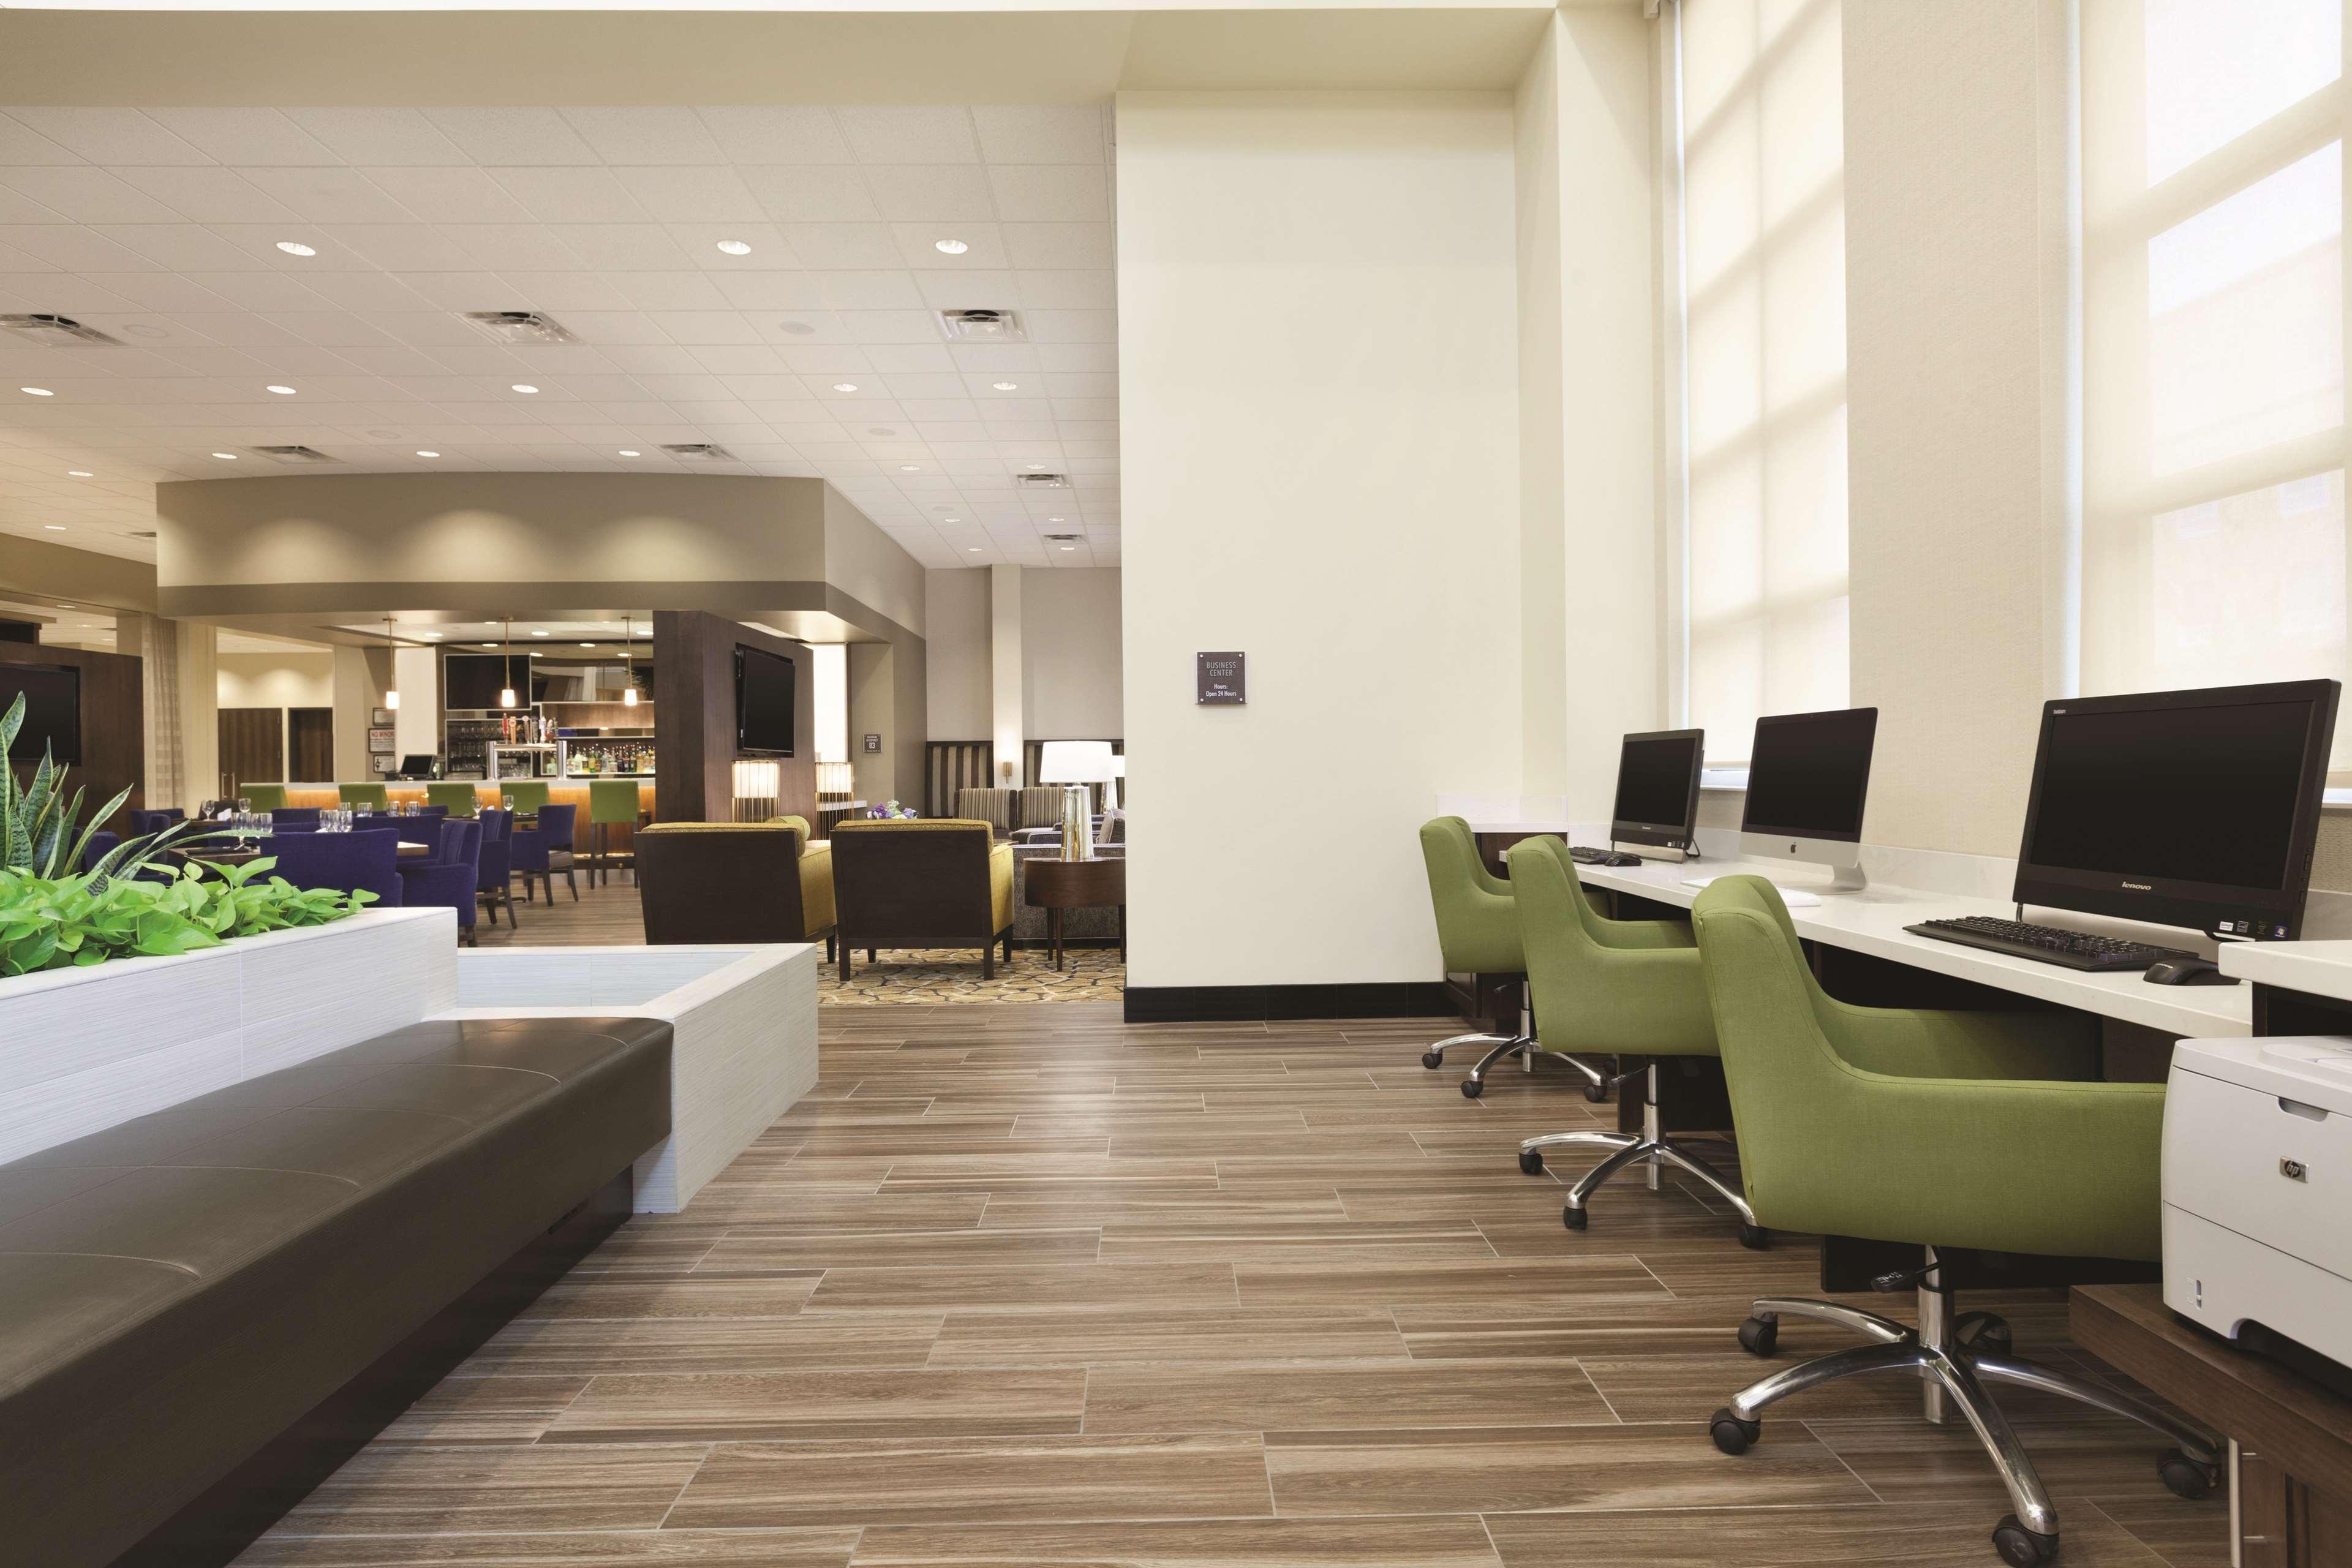 Embassy Suites by Hilton Portland Hillsboro, Oregon image 41